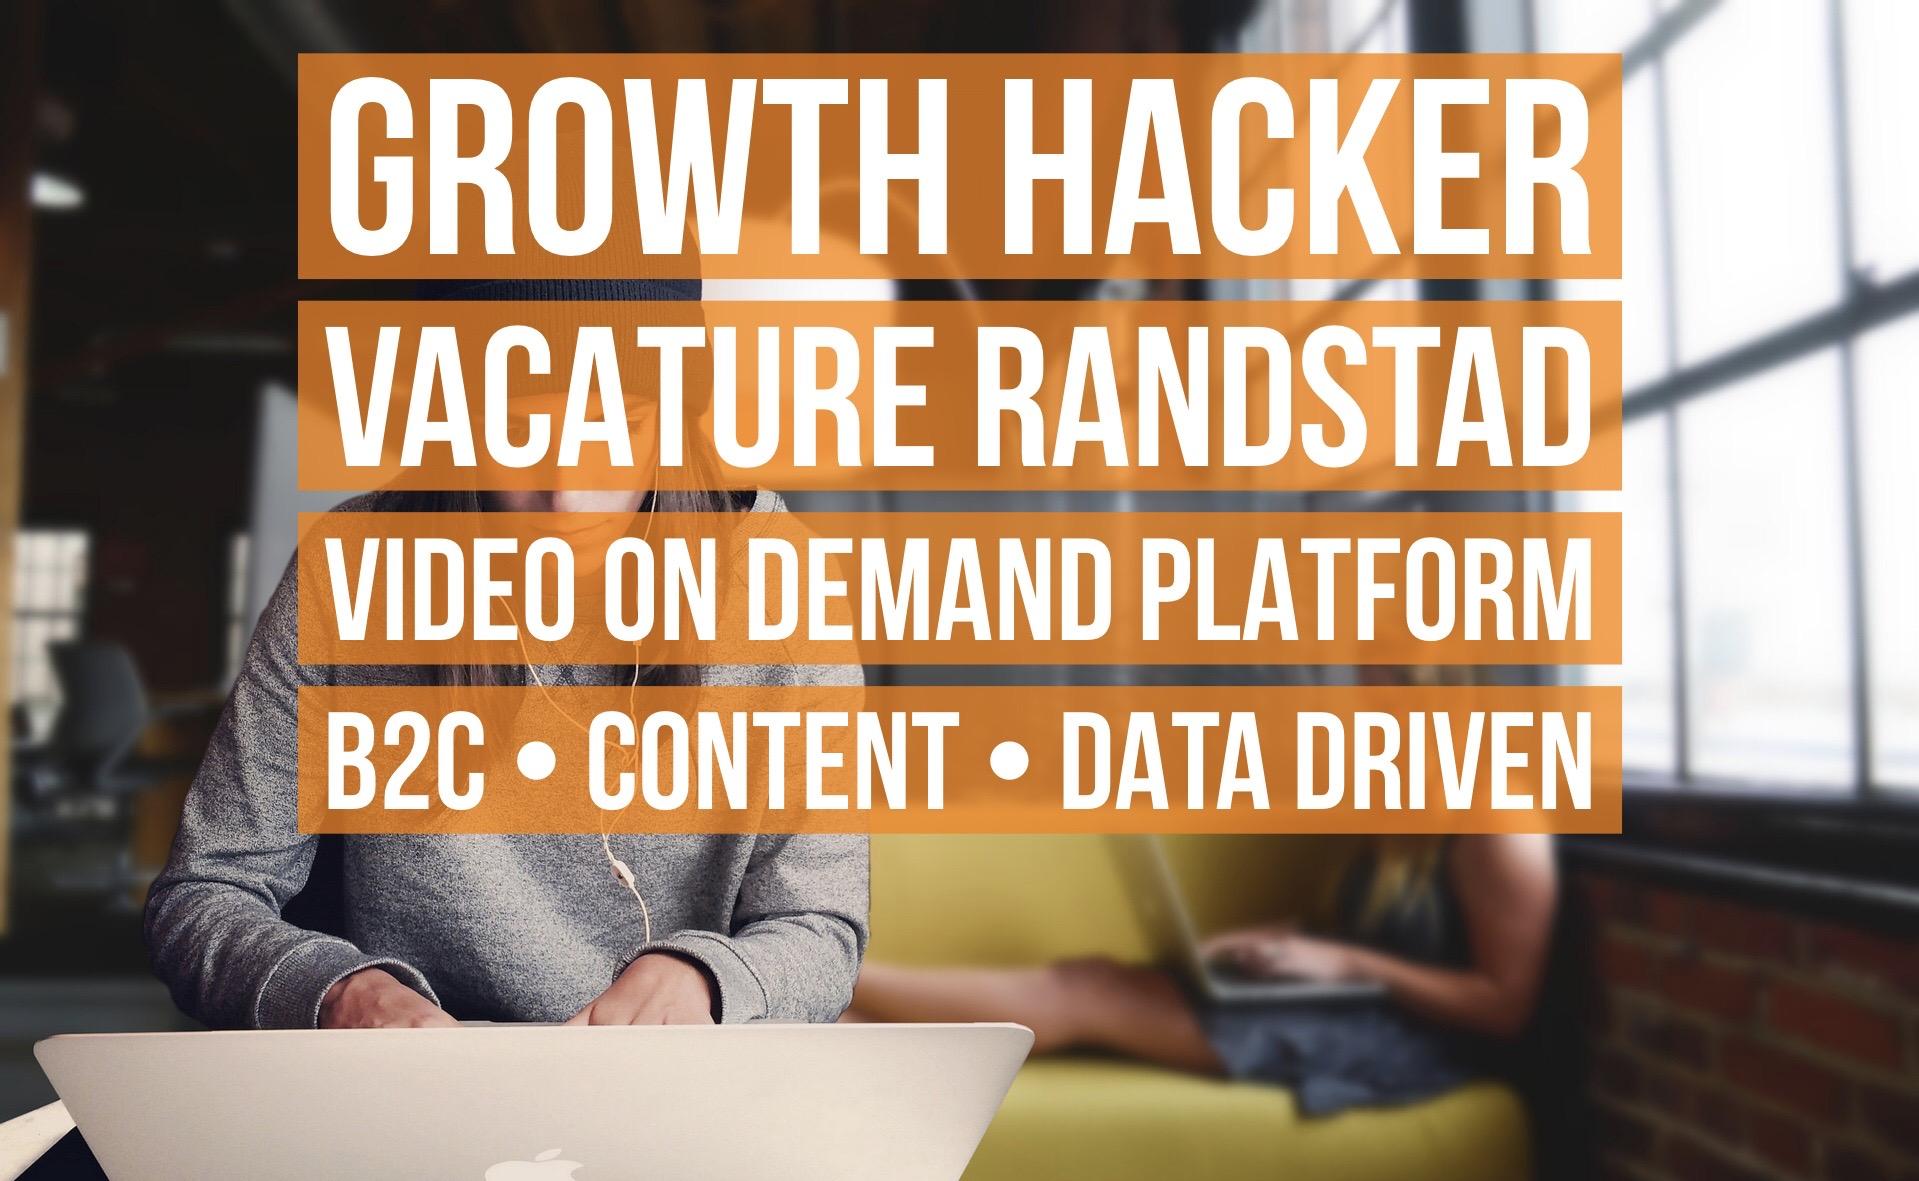 Growth Hacker vacature randstad video on demand platform b2c content data driven